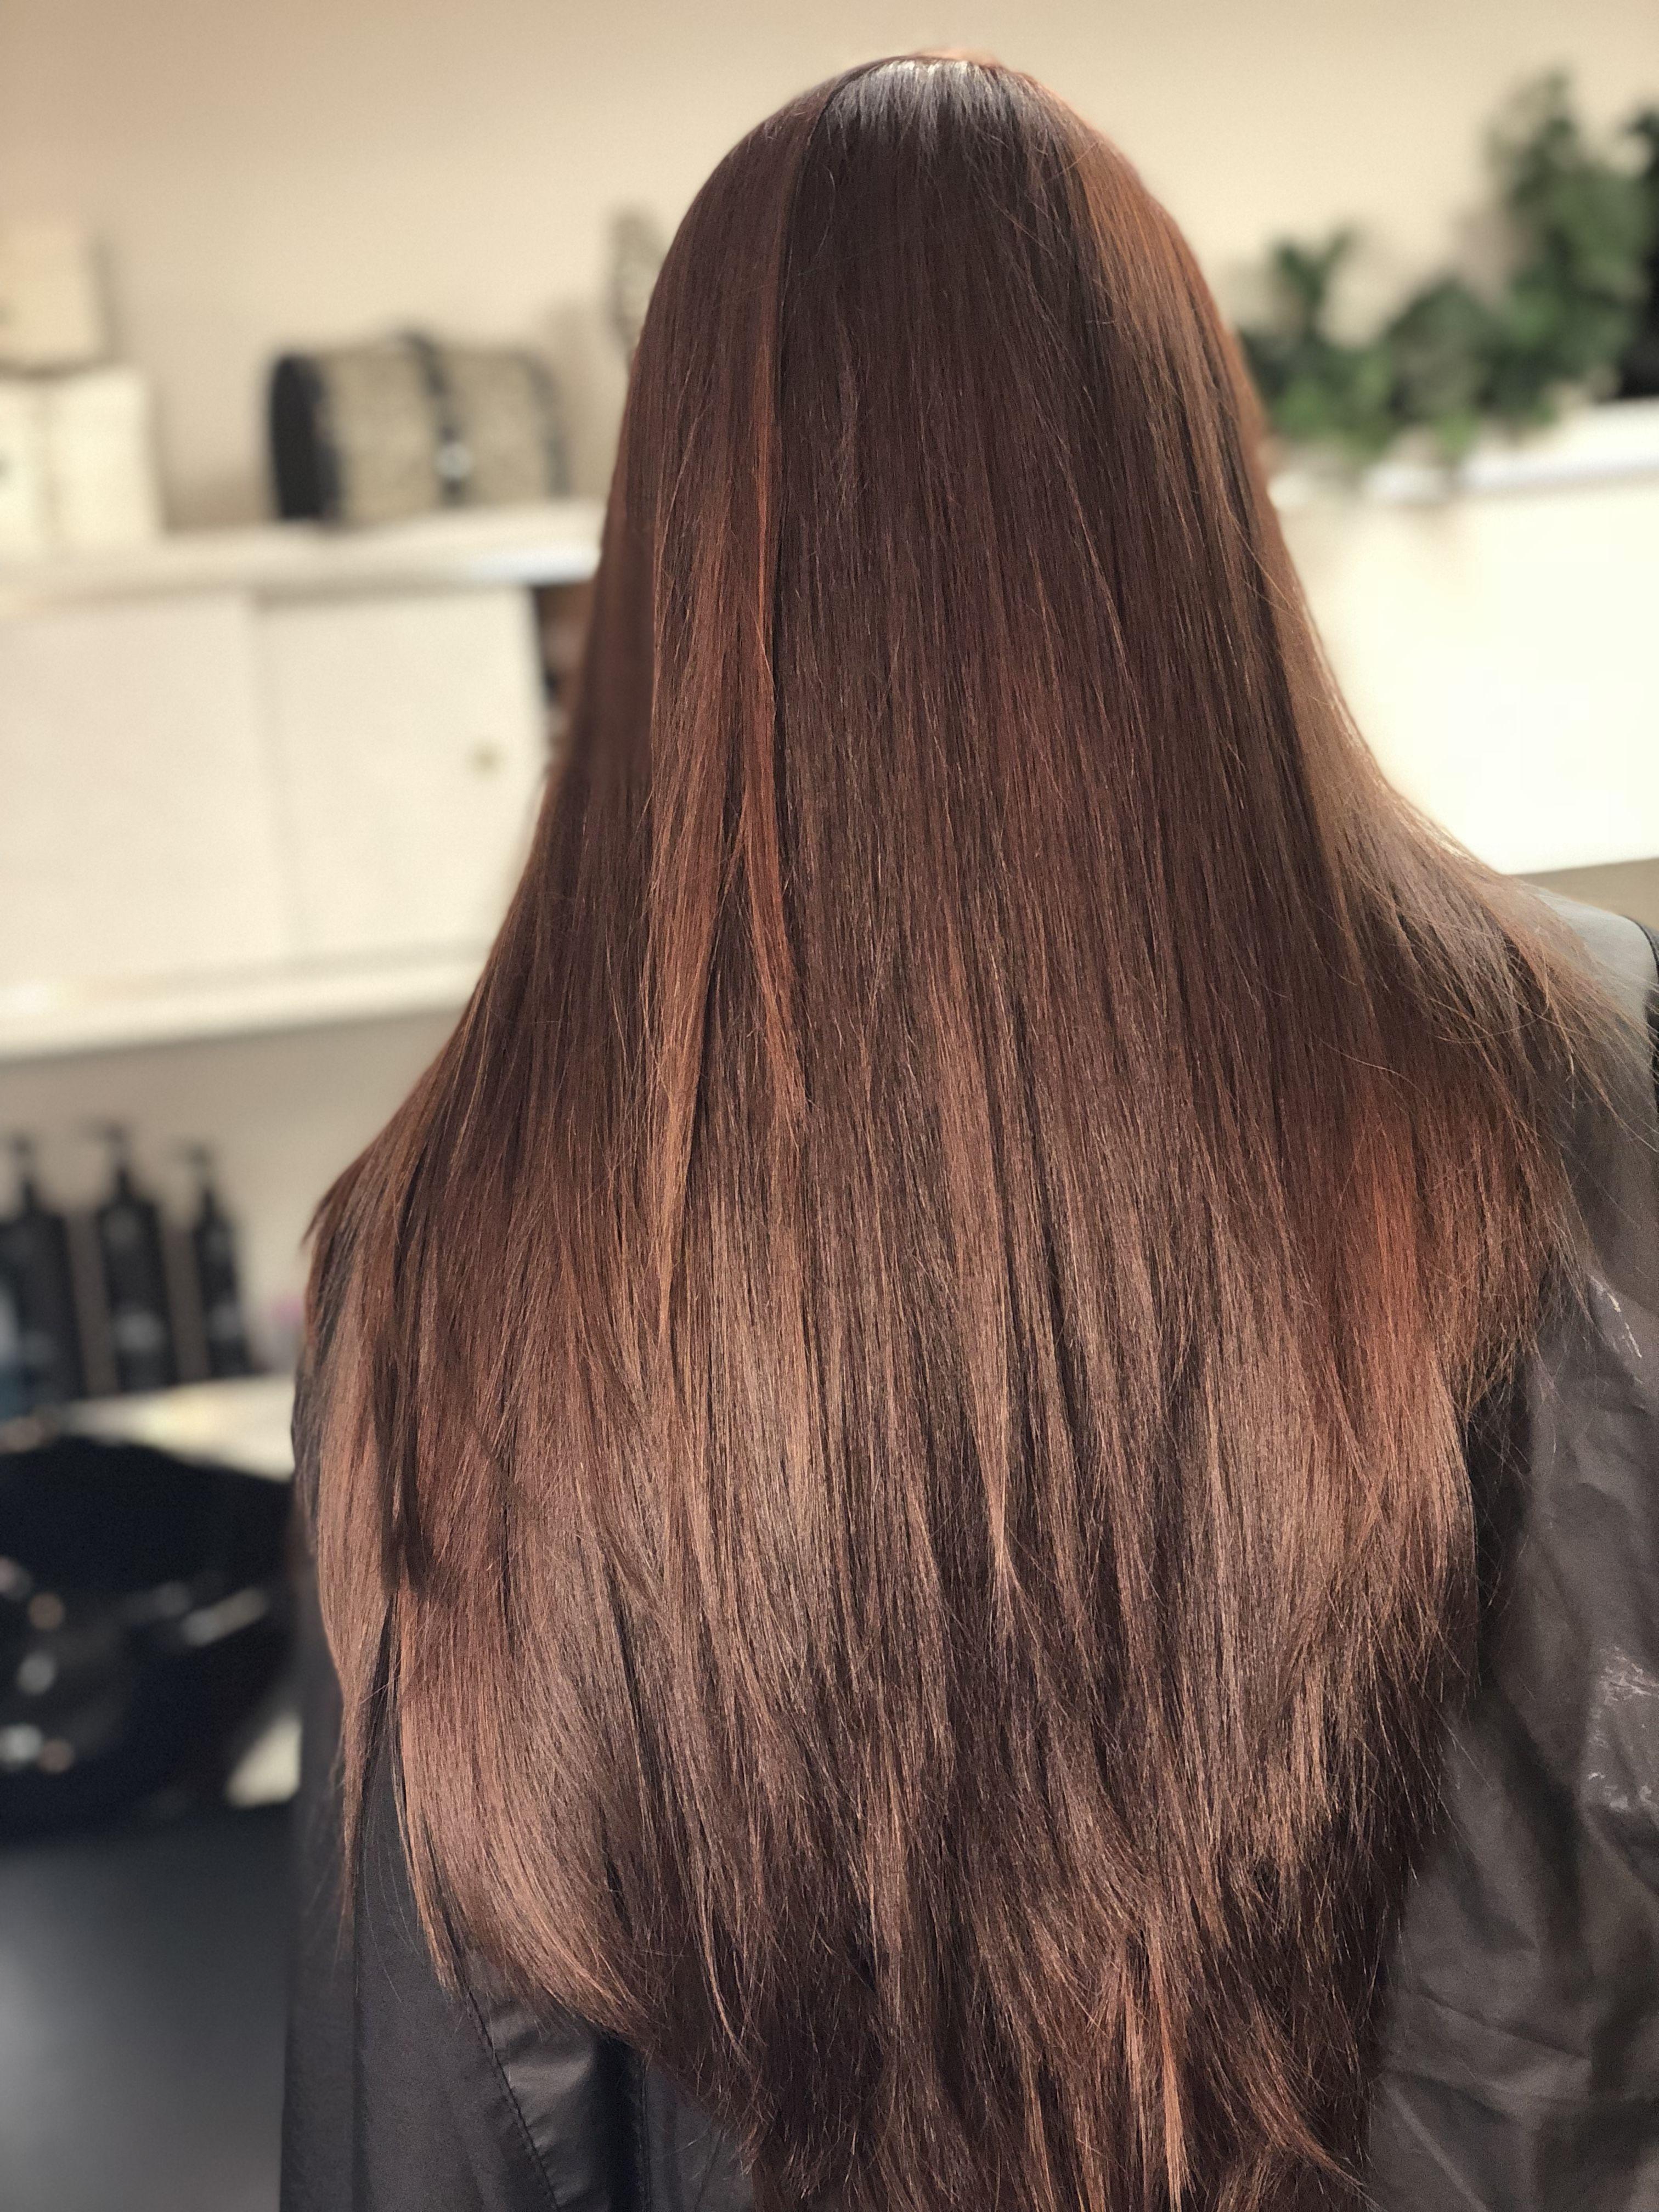 All Nutrient Hair Color Virgin Hair 7rc Dot Of 6ic 20 Volume